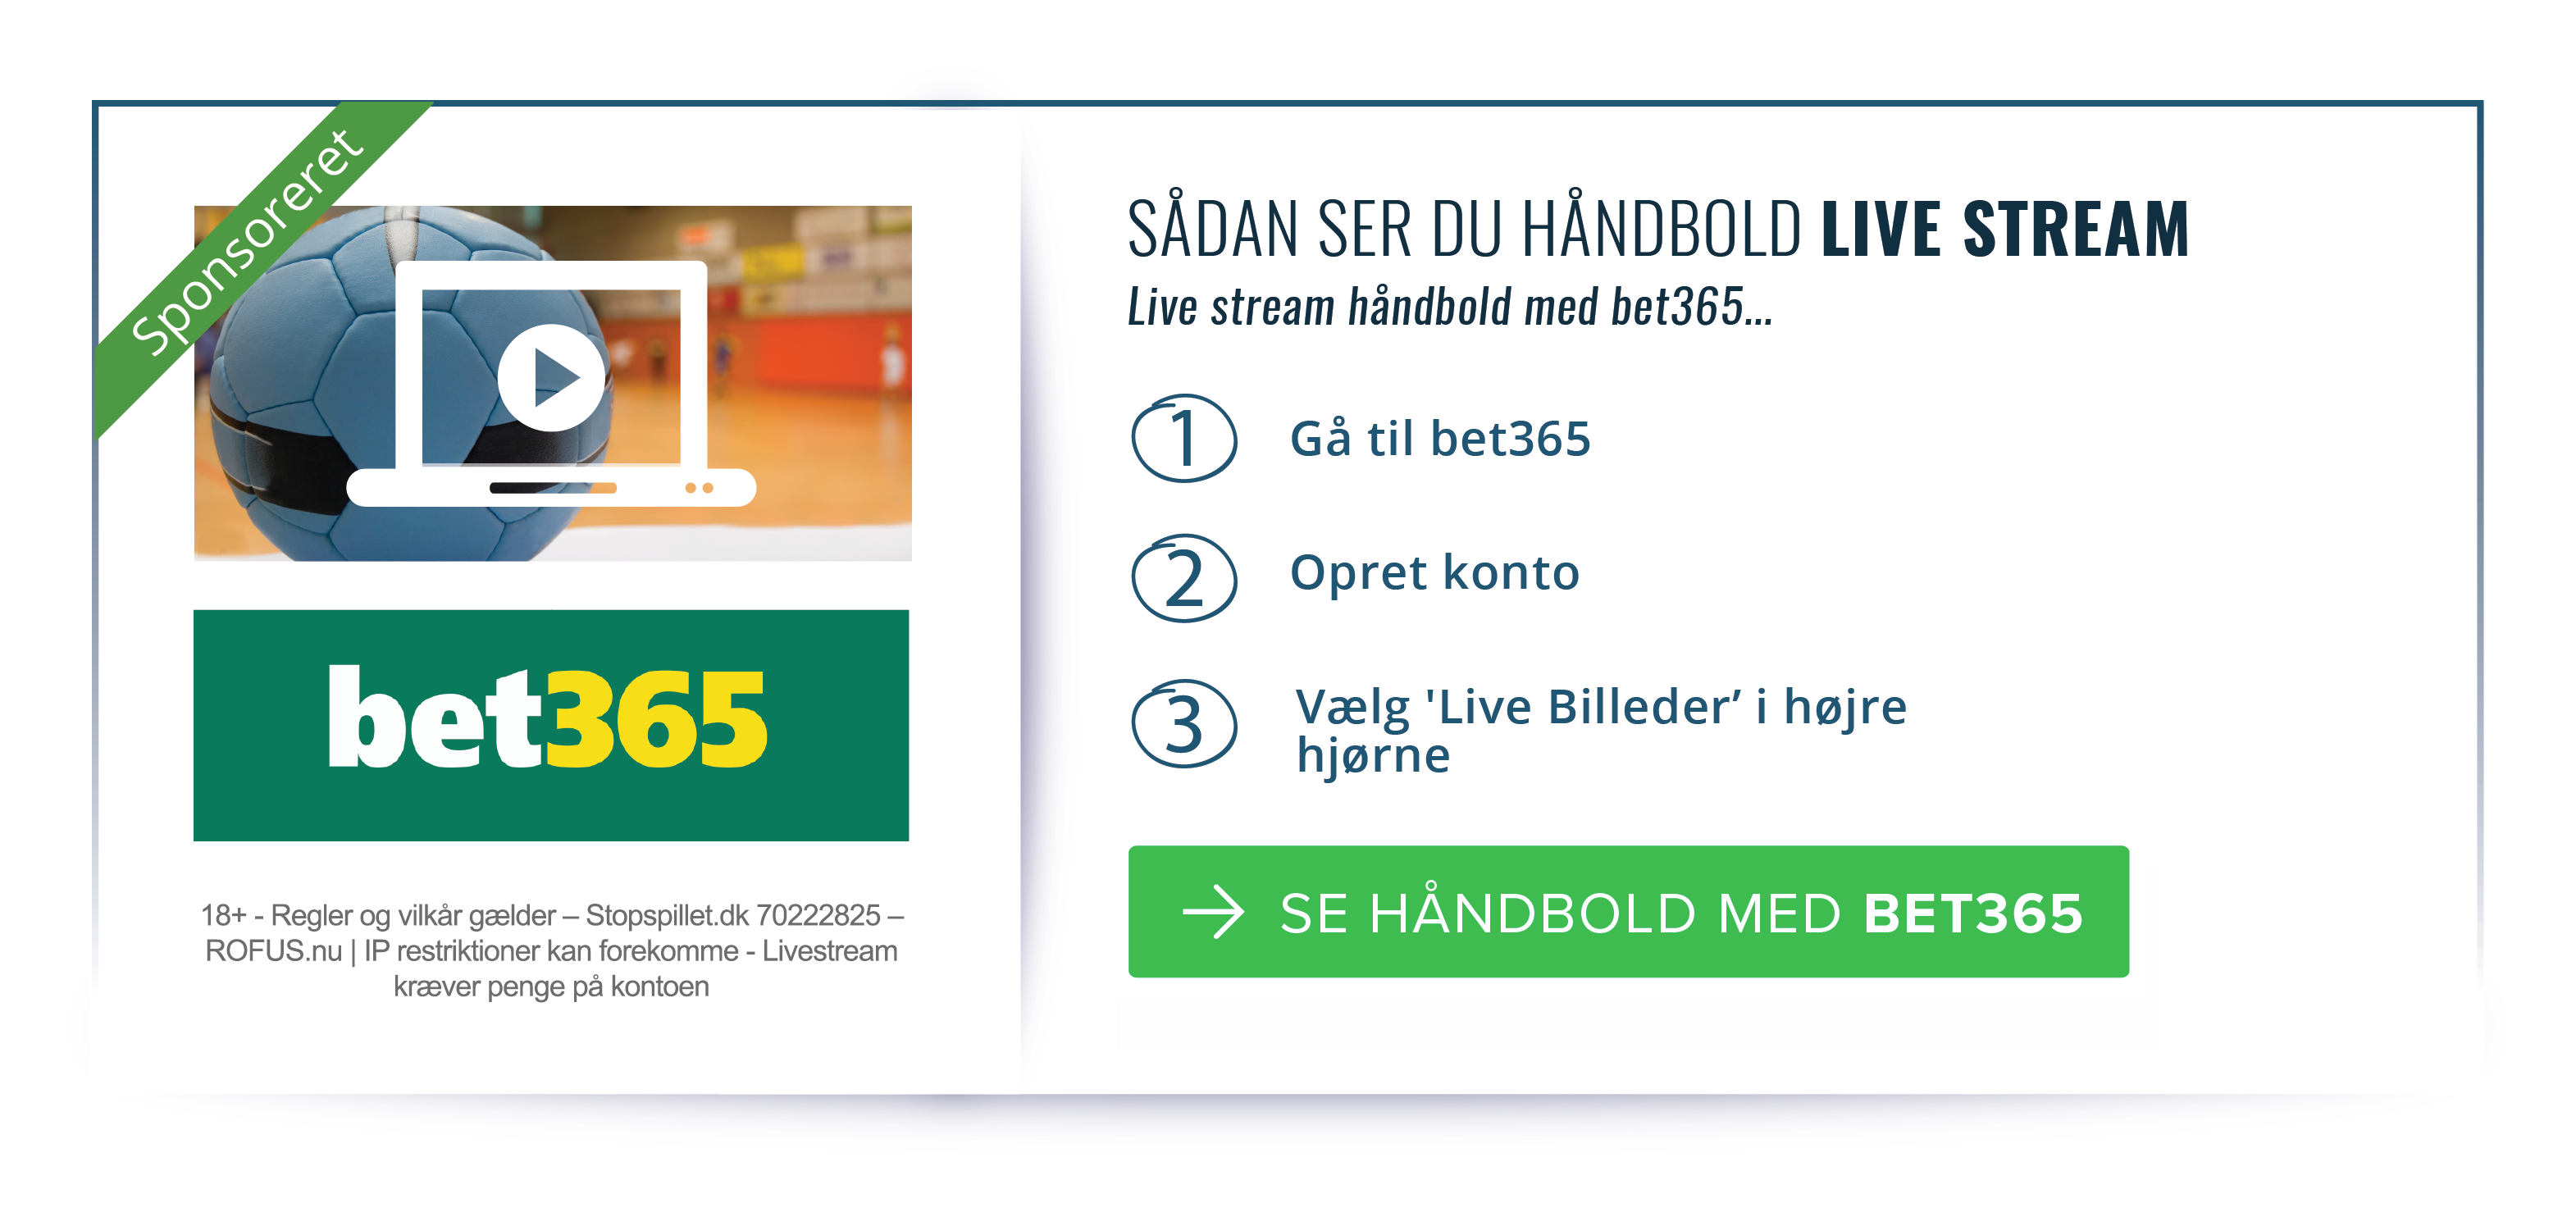 bet365 håndbold live stream